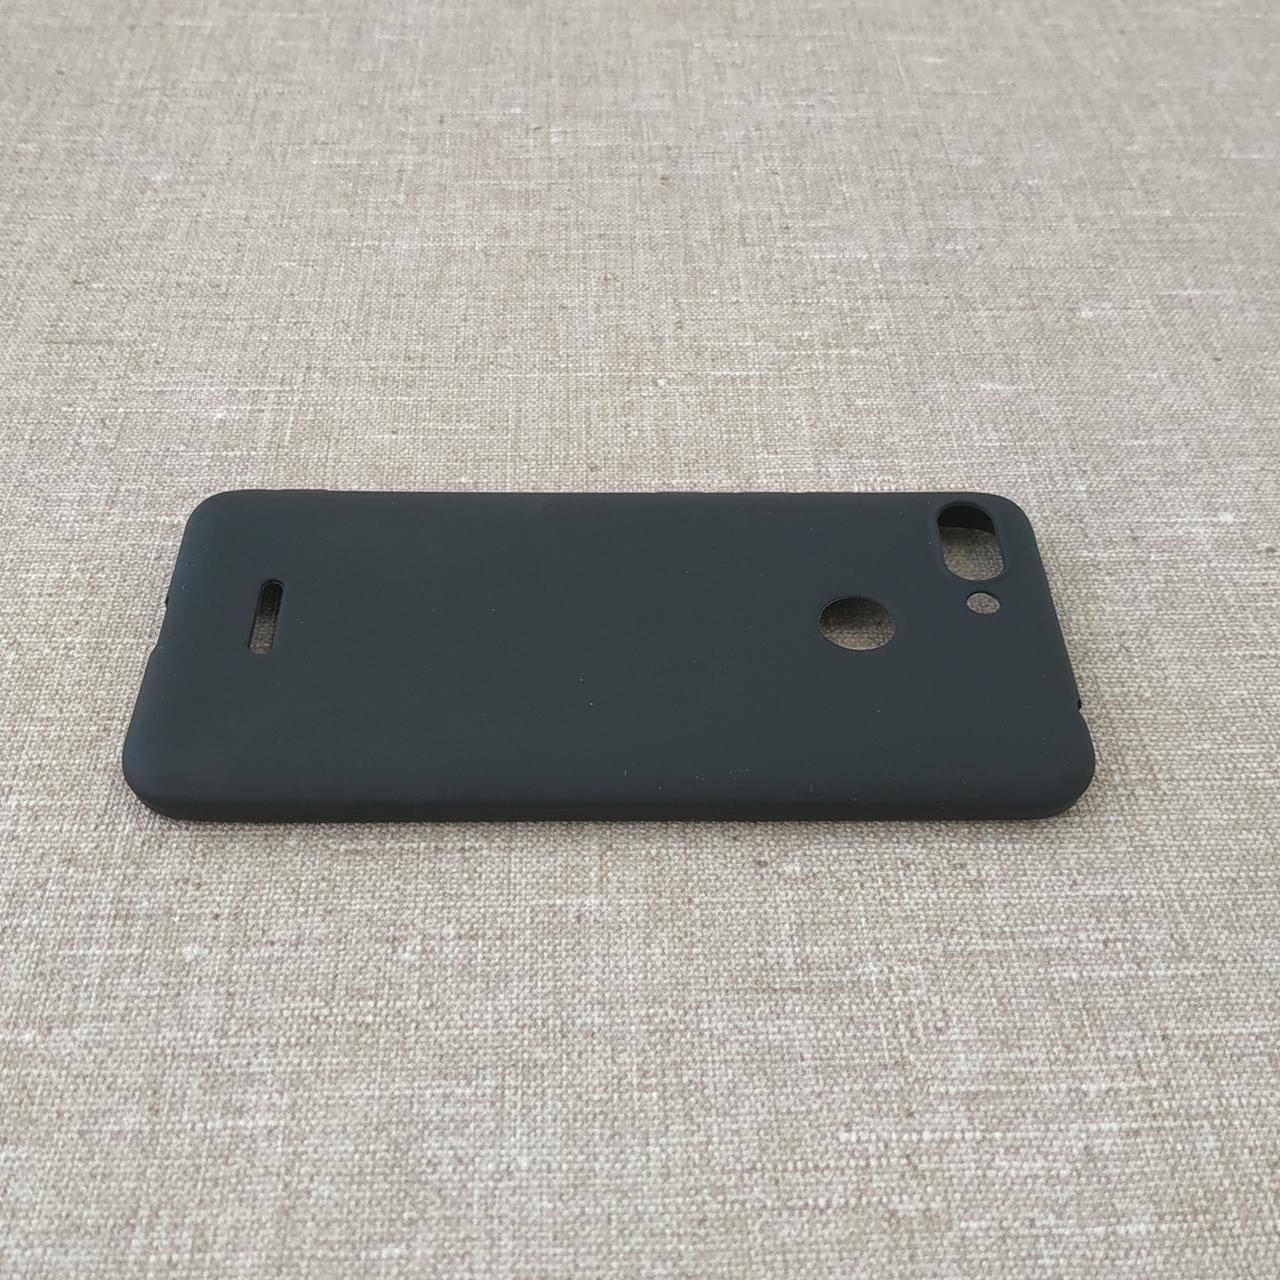 Чехол Honor Umatt Xiaomi Redmi 6 black Для телефона